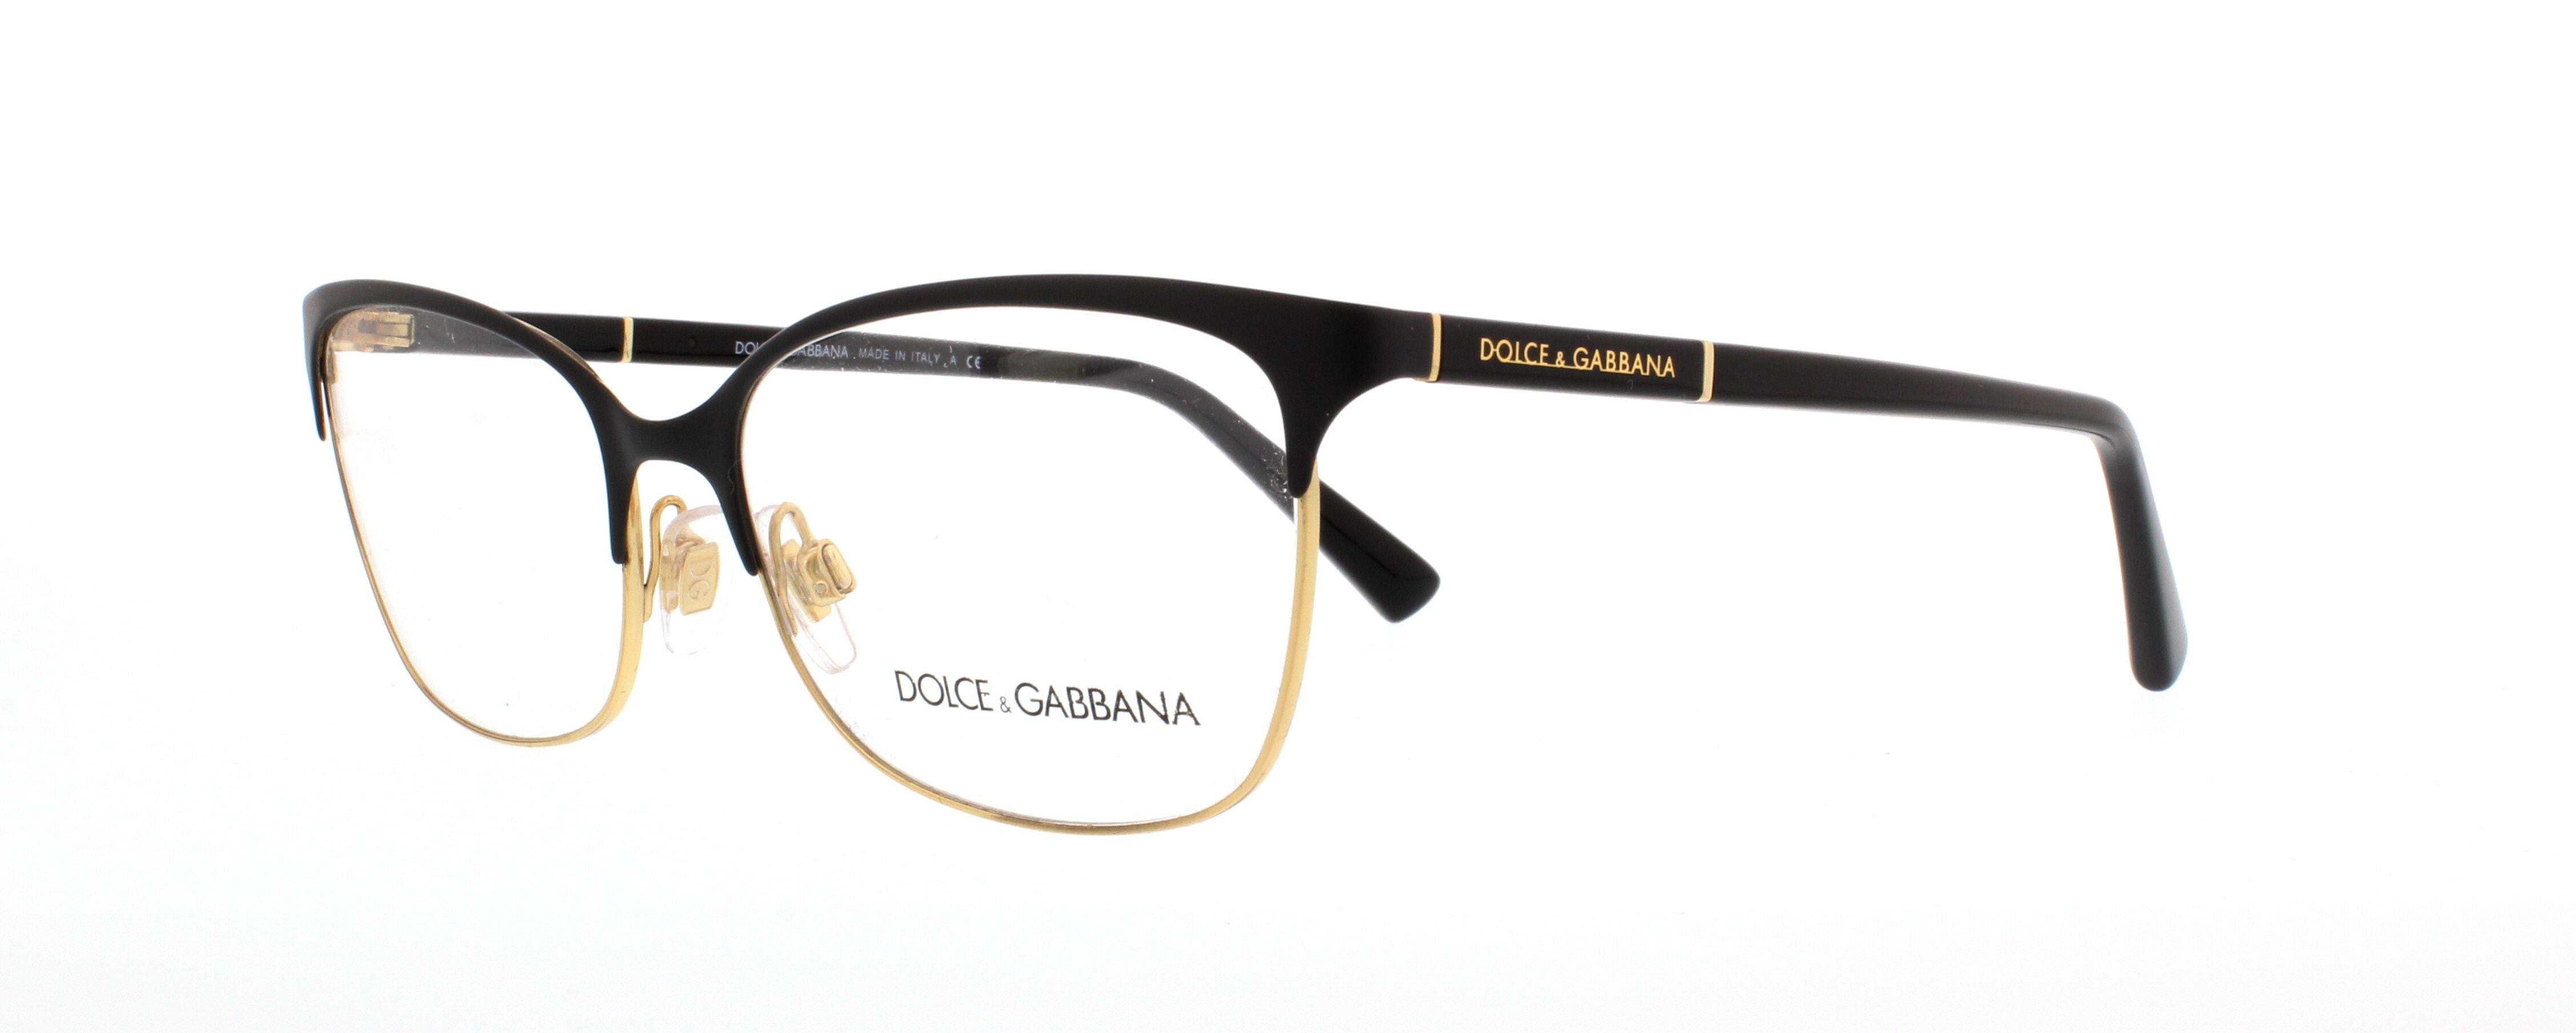 eacf2ec4a31a Dolce And Gabbana Eyeglasses Women